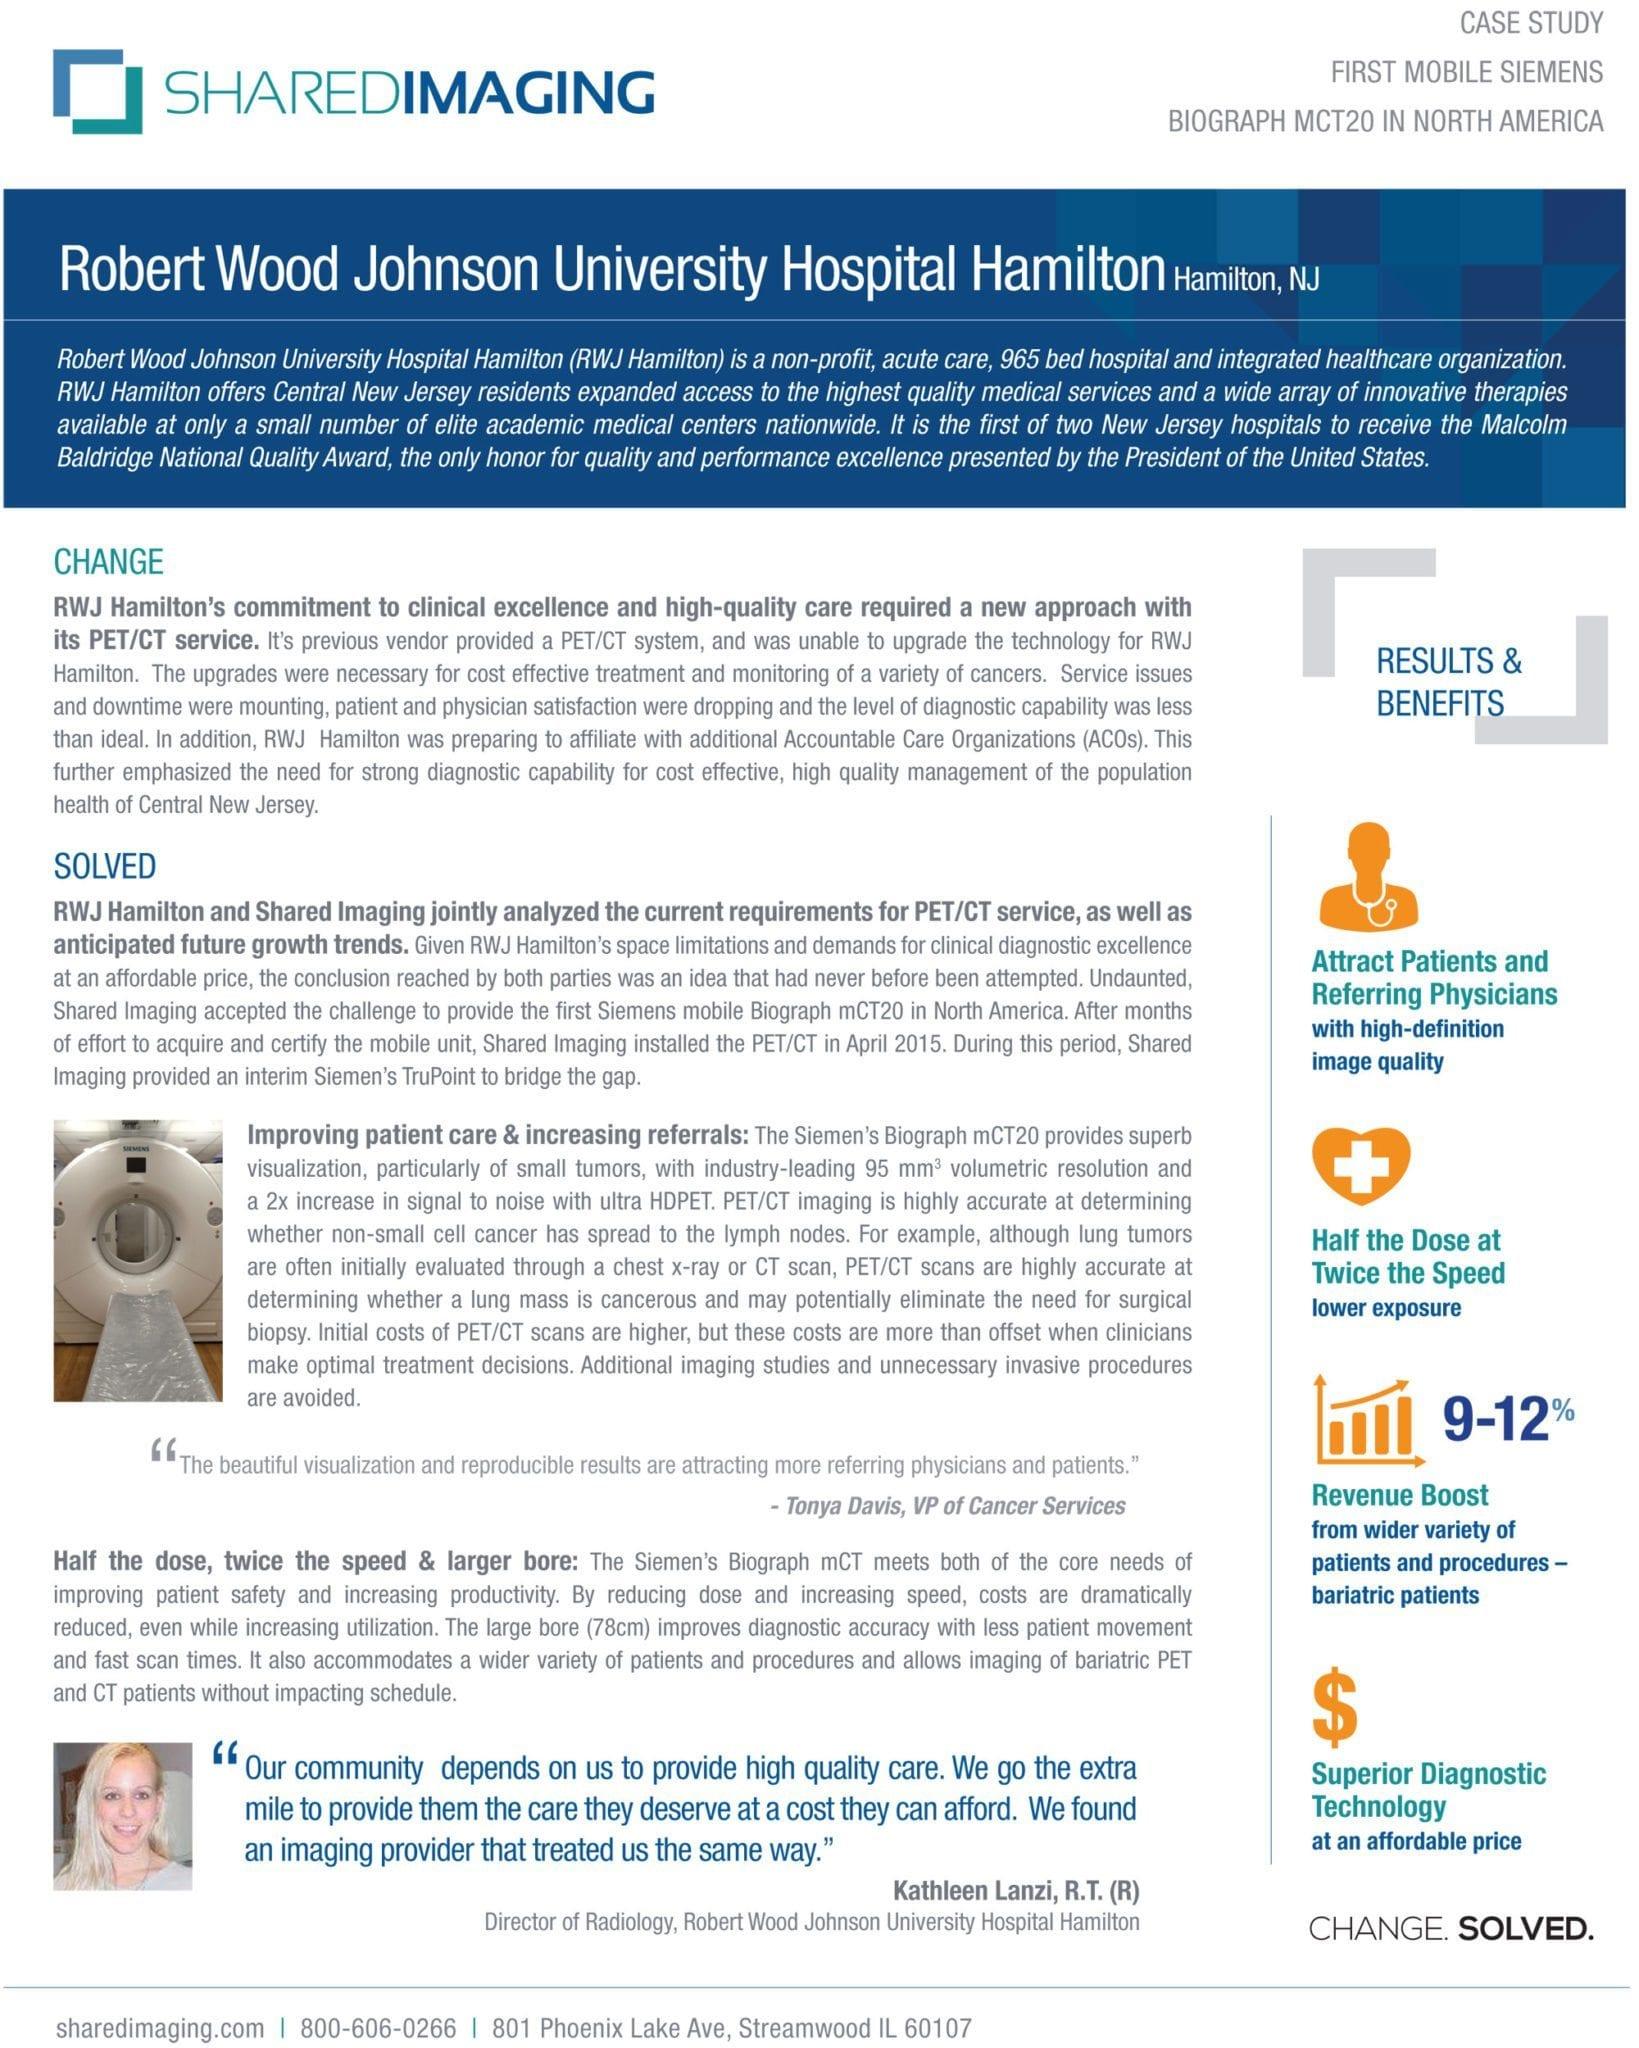 Robert Wood Johnson University Hospital Hamilton Case Study